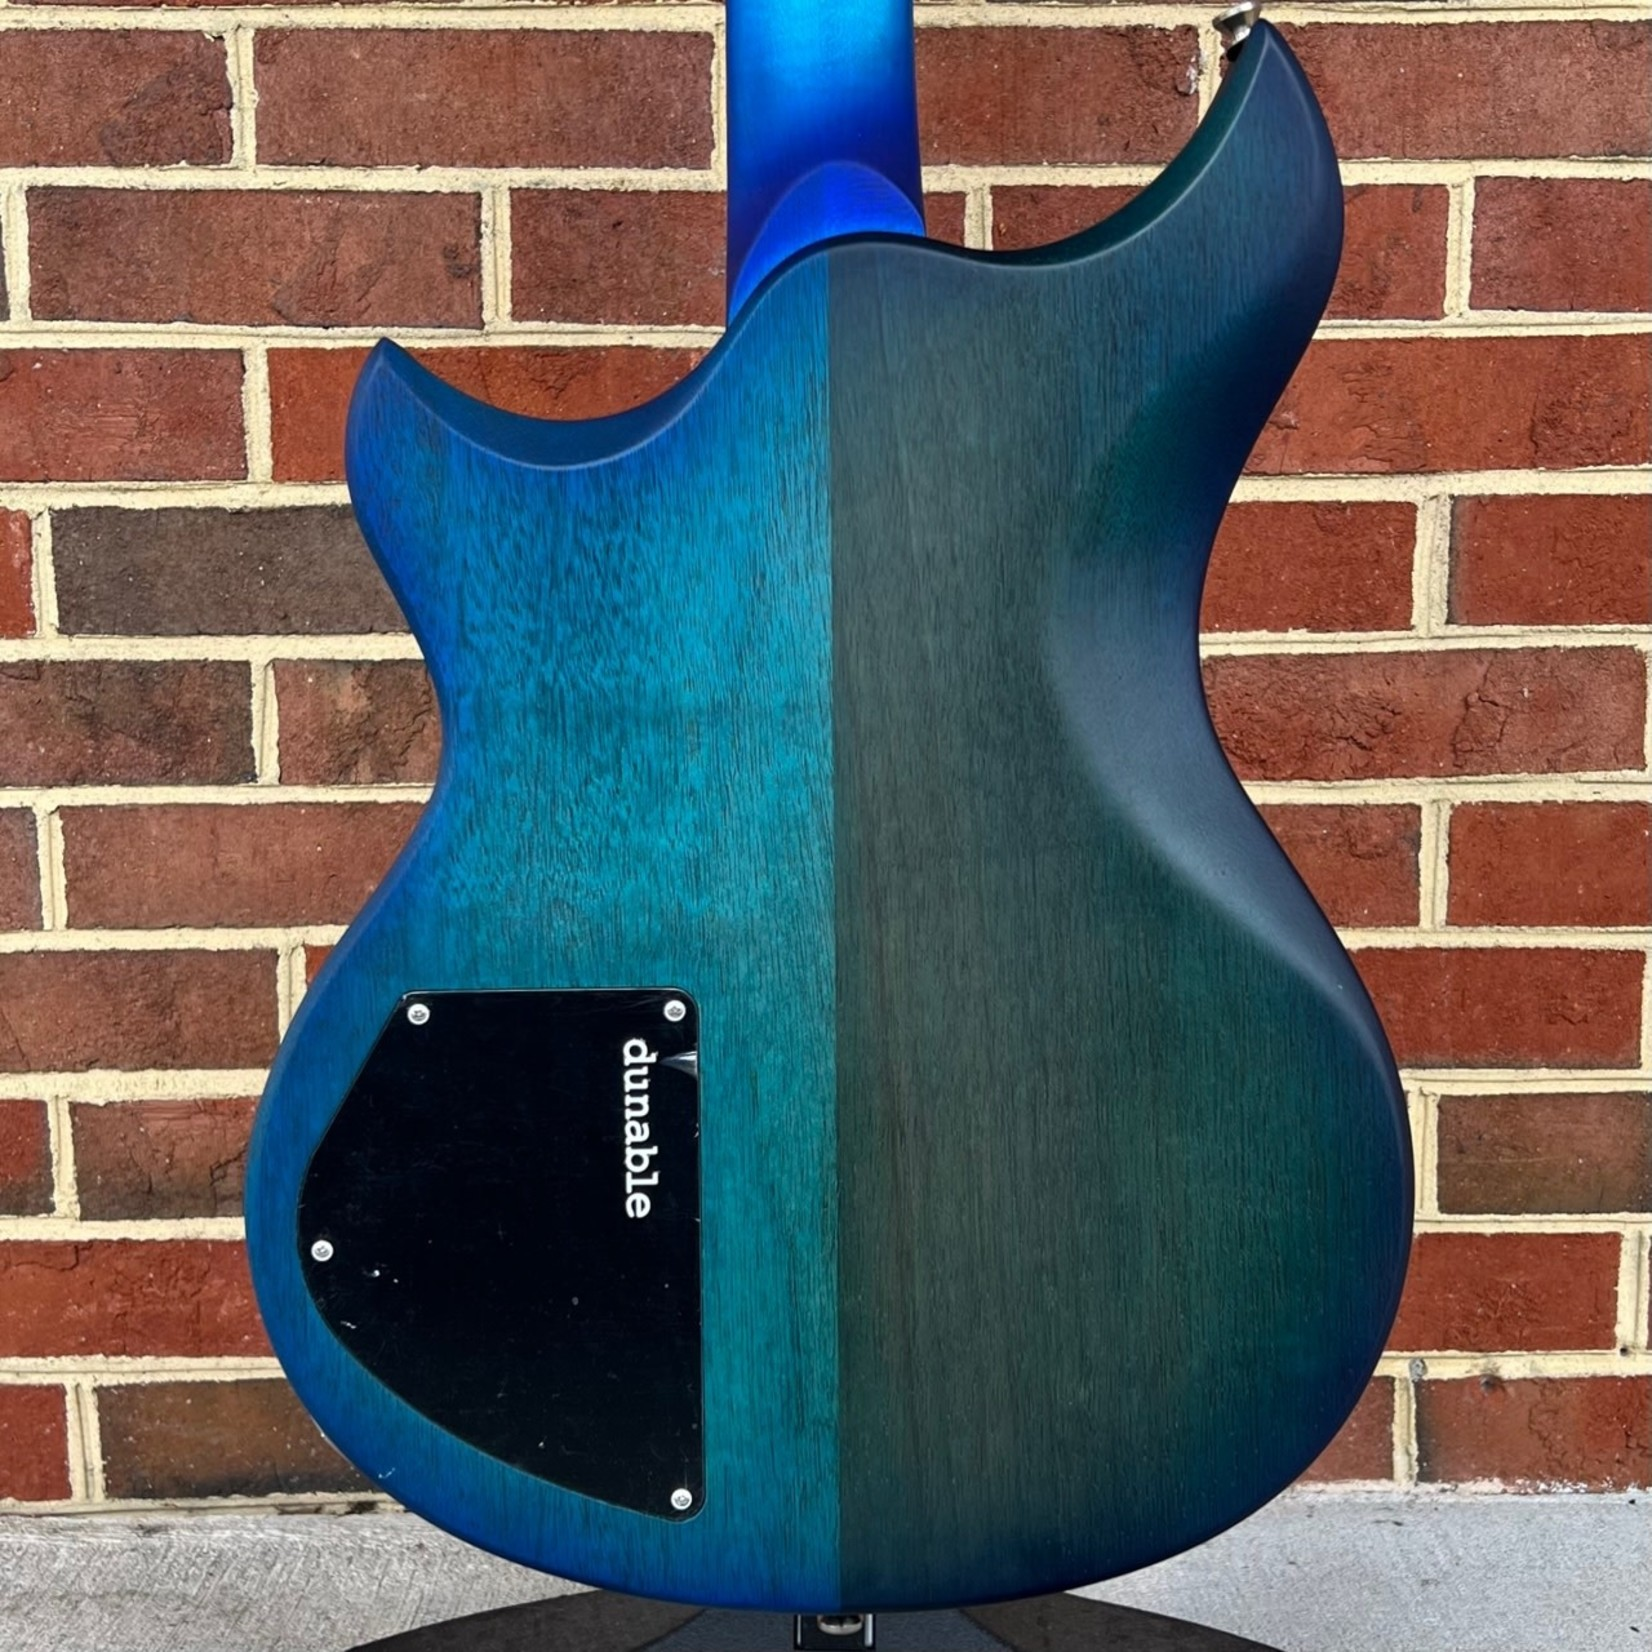 Dunable Guitars Dunable Guitars USA Custom Shop Cyclops, Aqua Burst, Burl Maple Top, Mahogany Body, Stained Aqua Burst Maple Fretboard, Block Inlays, Hardshell Case